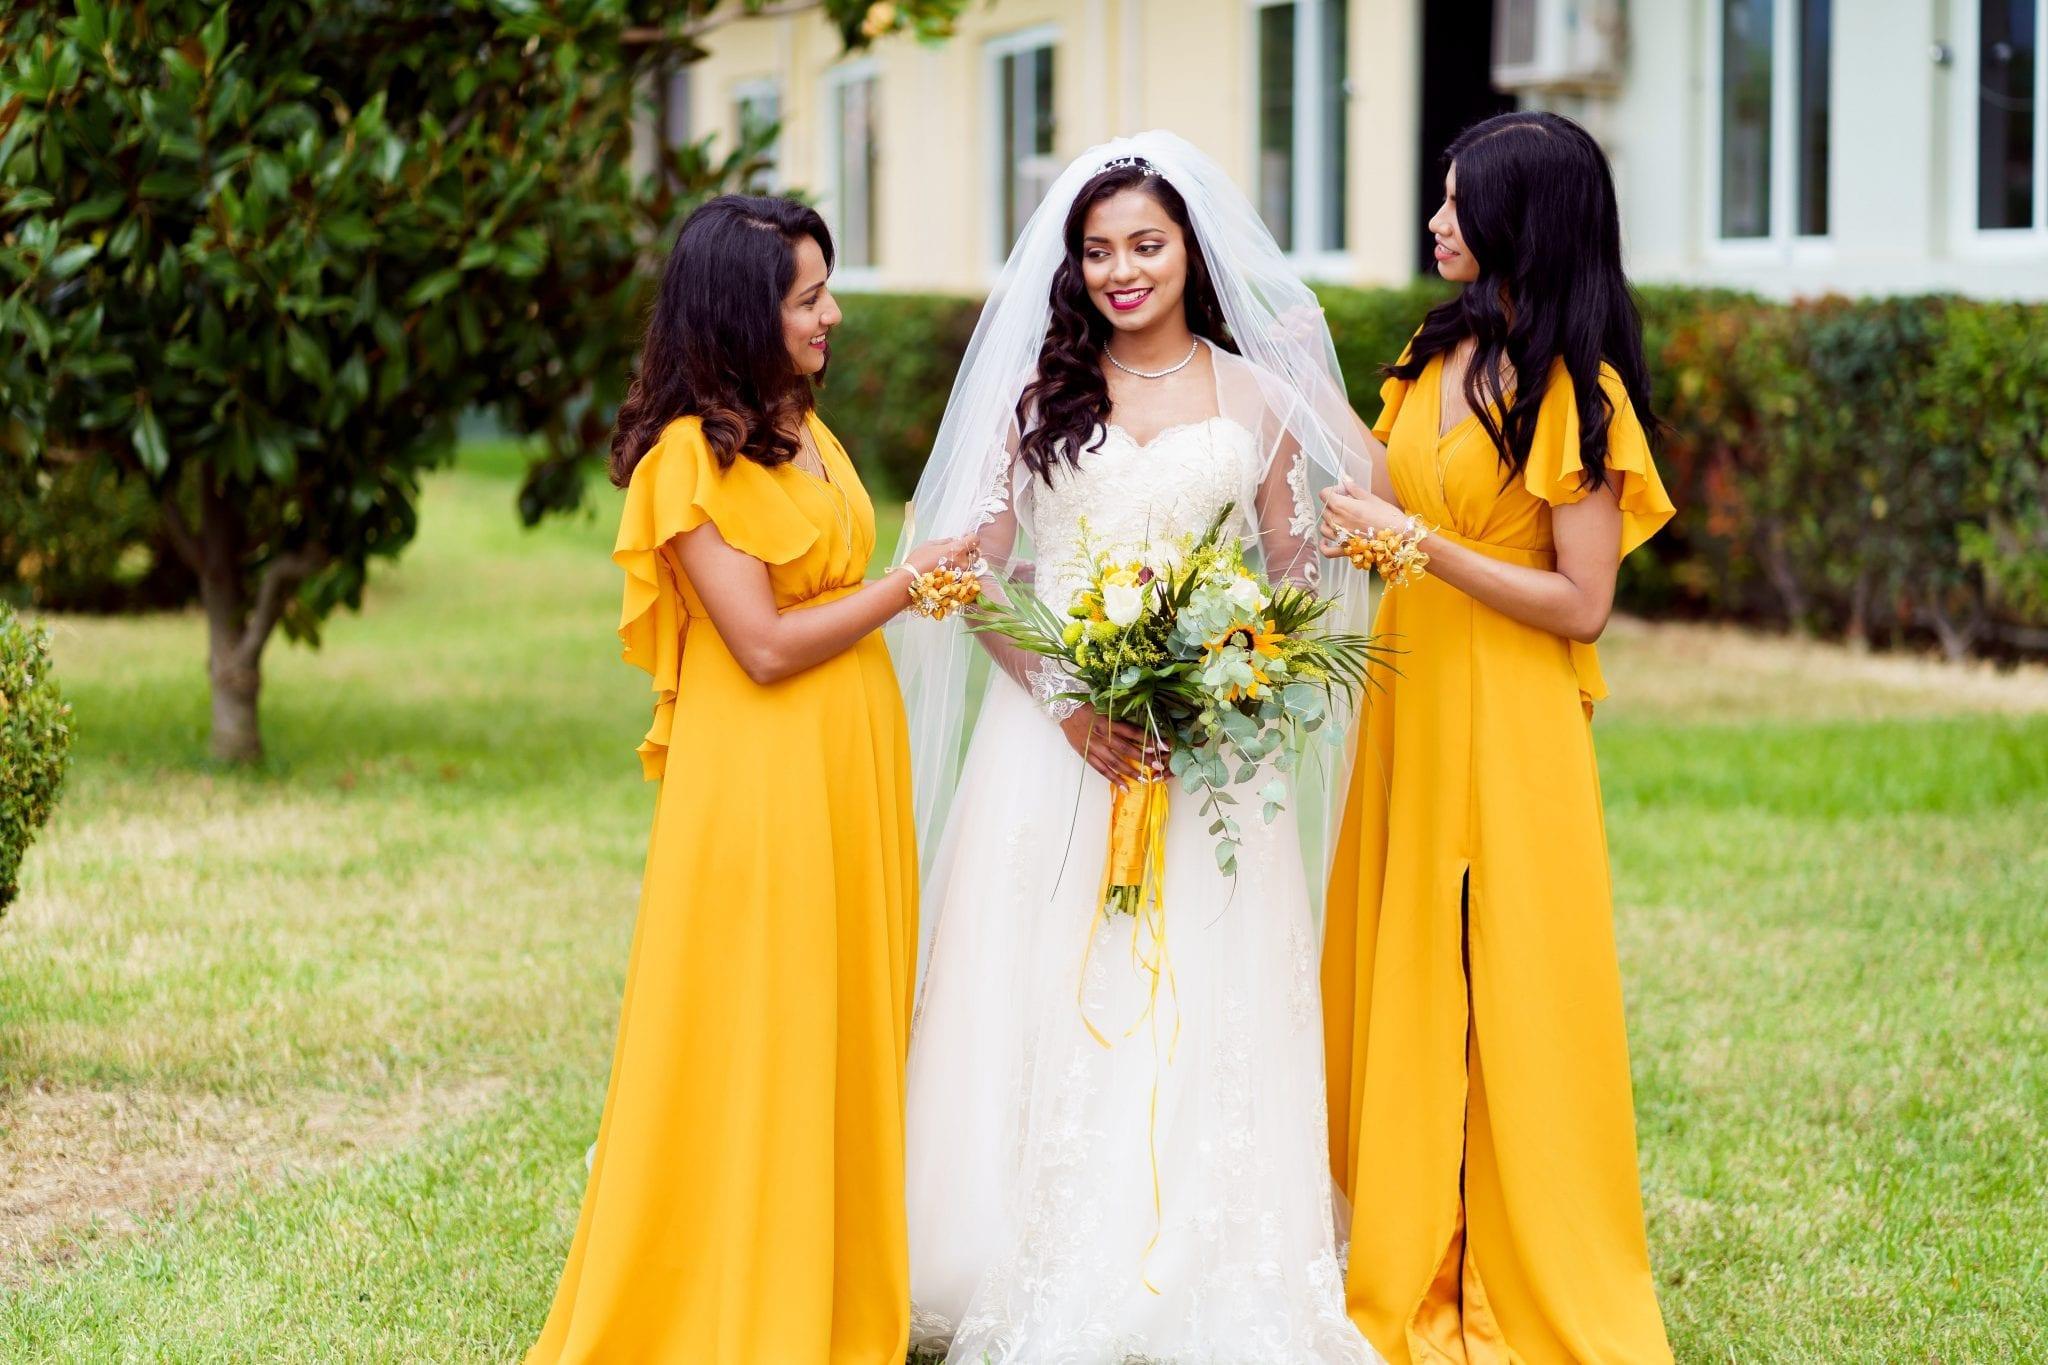 Documentary Wedding Photography - Bride & Bridesmaids